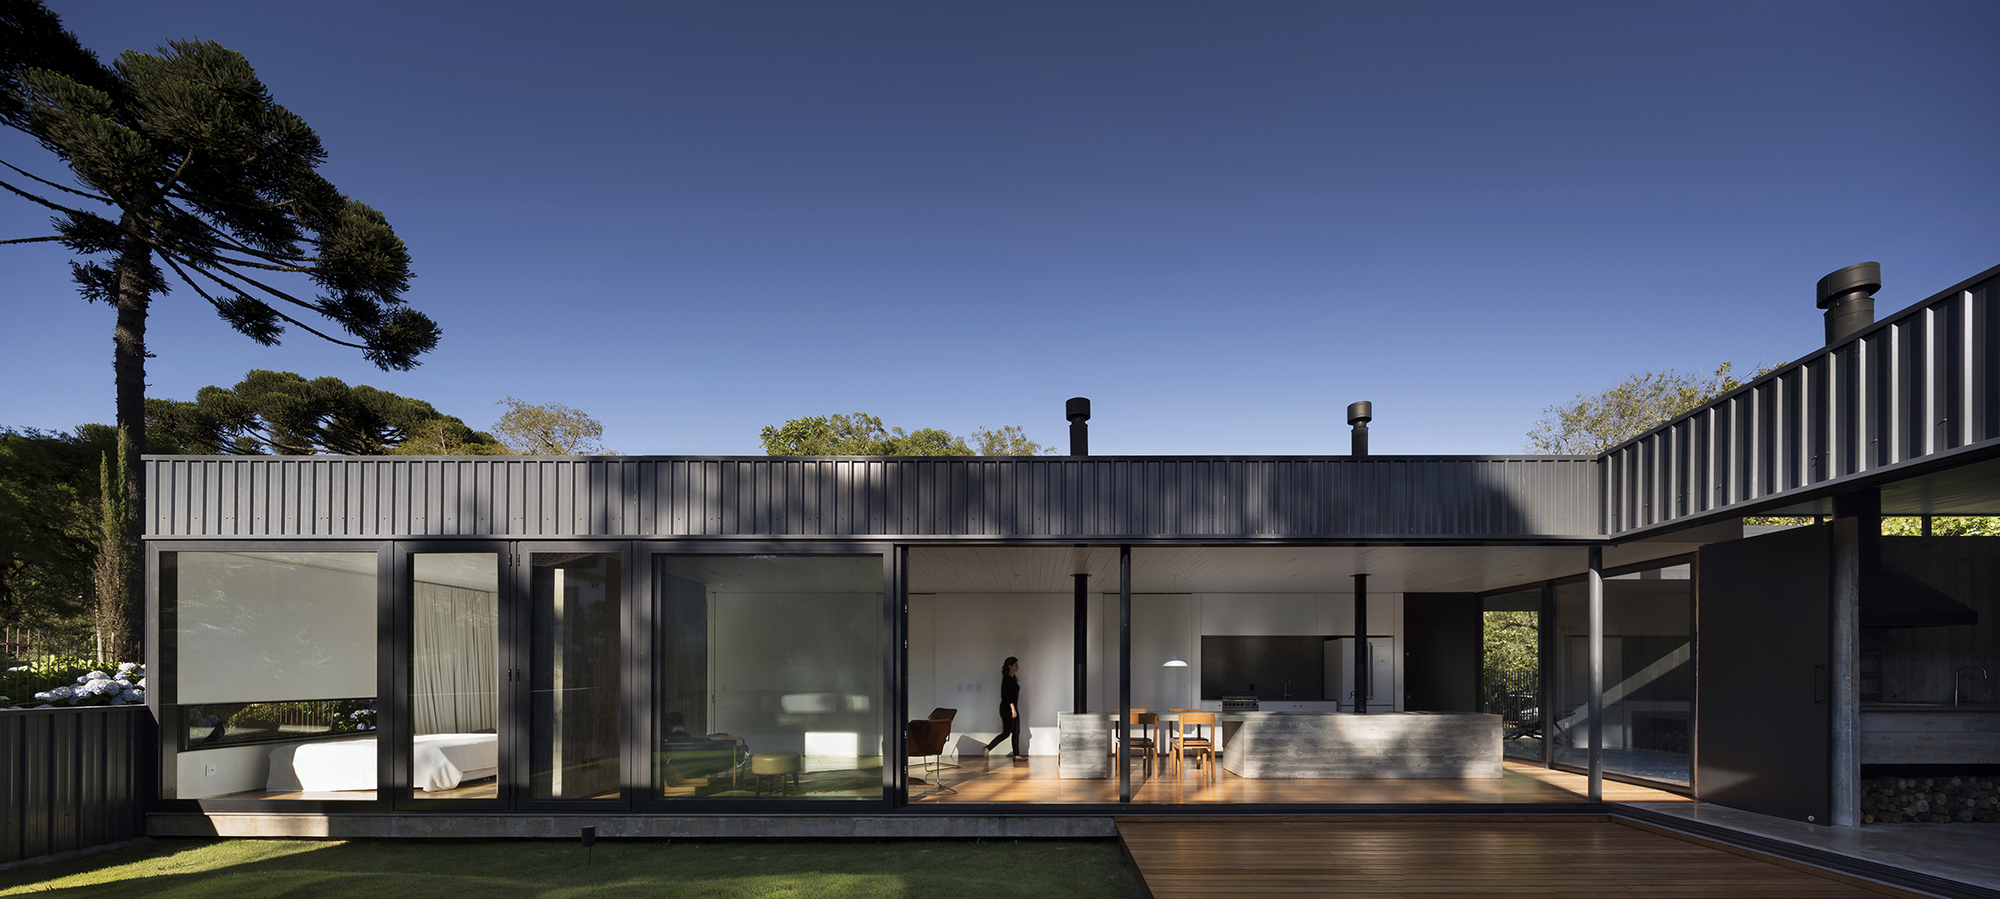 Lata House / sauemartins